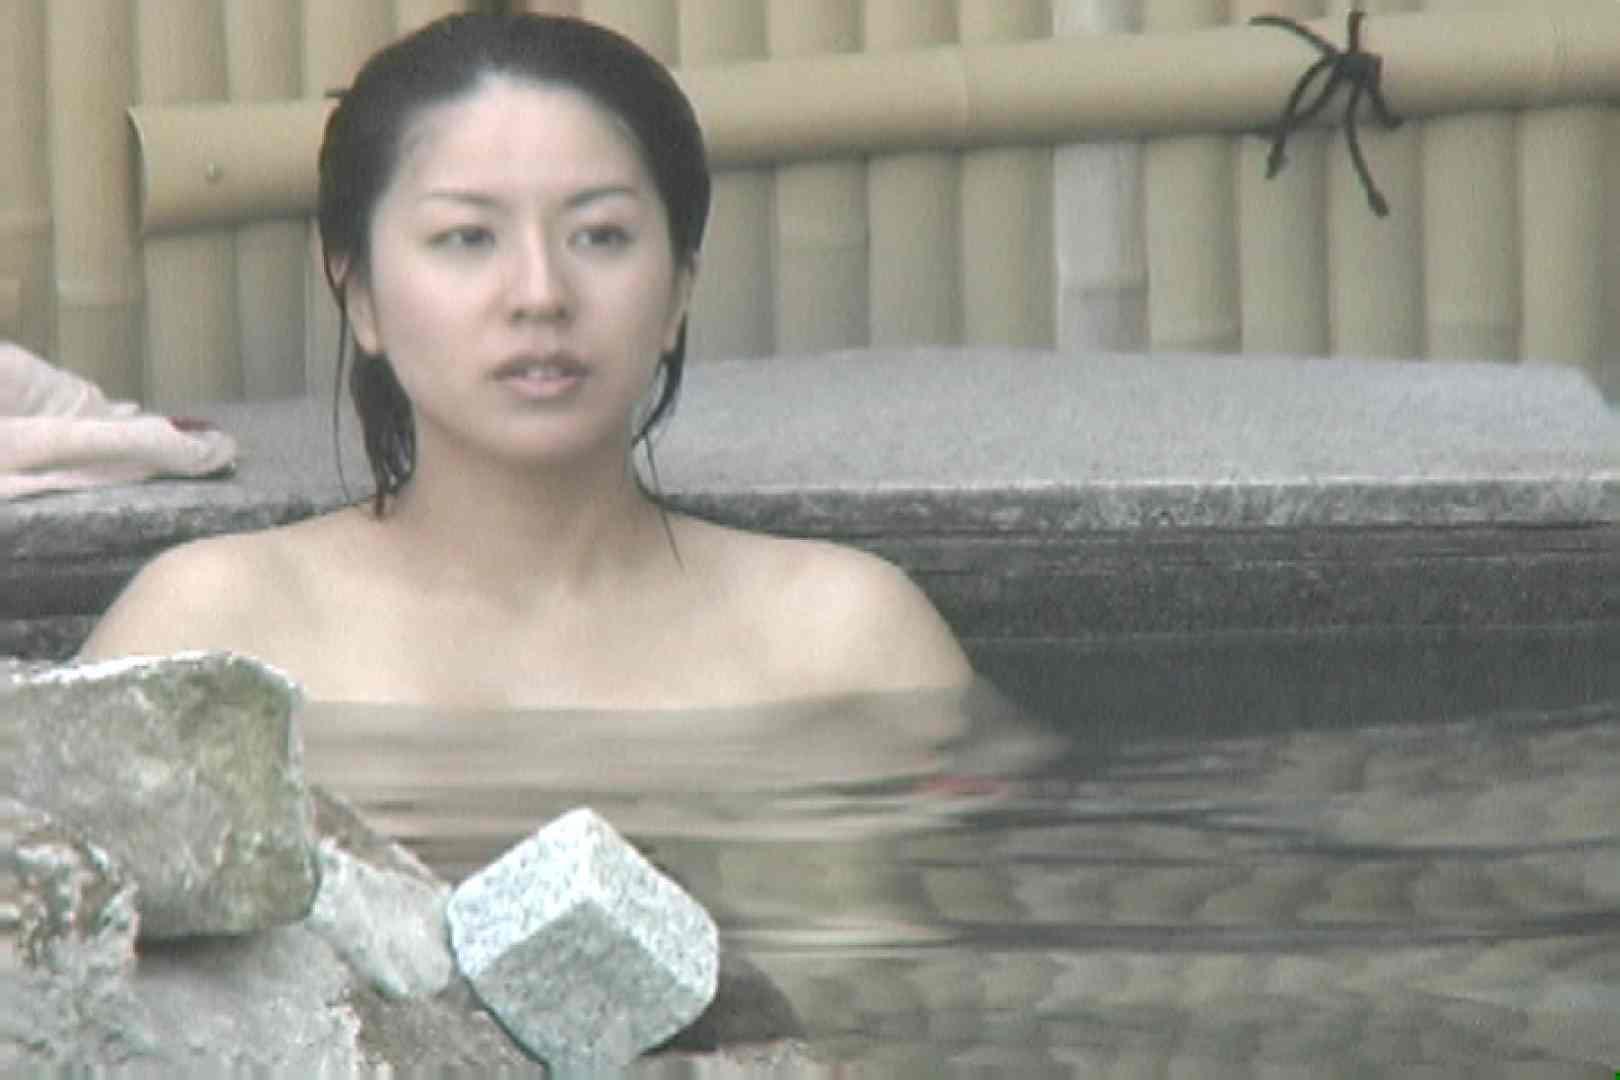 Aquaな露天風呂Vol.694 盗撮 | OLエロ画像  110PICs 1